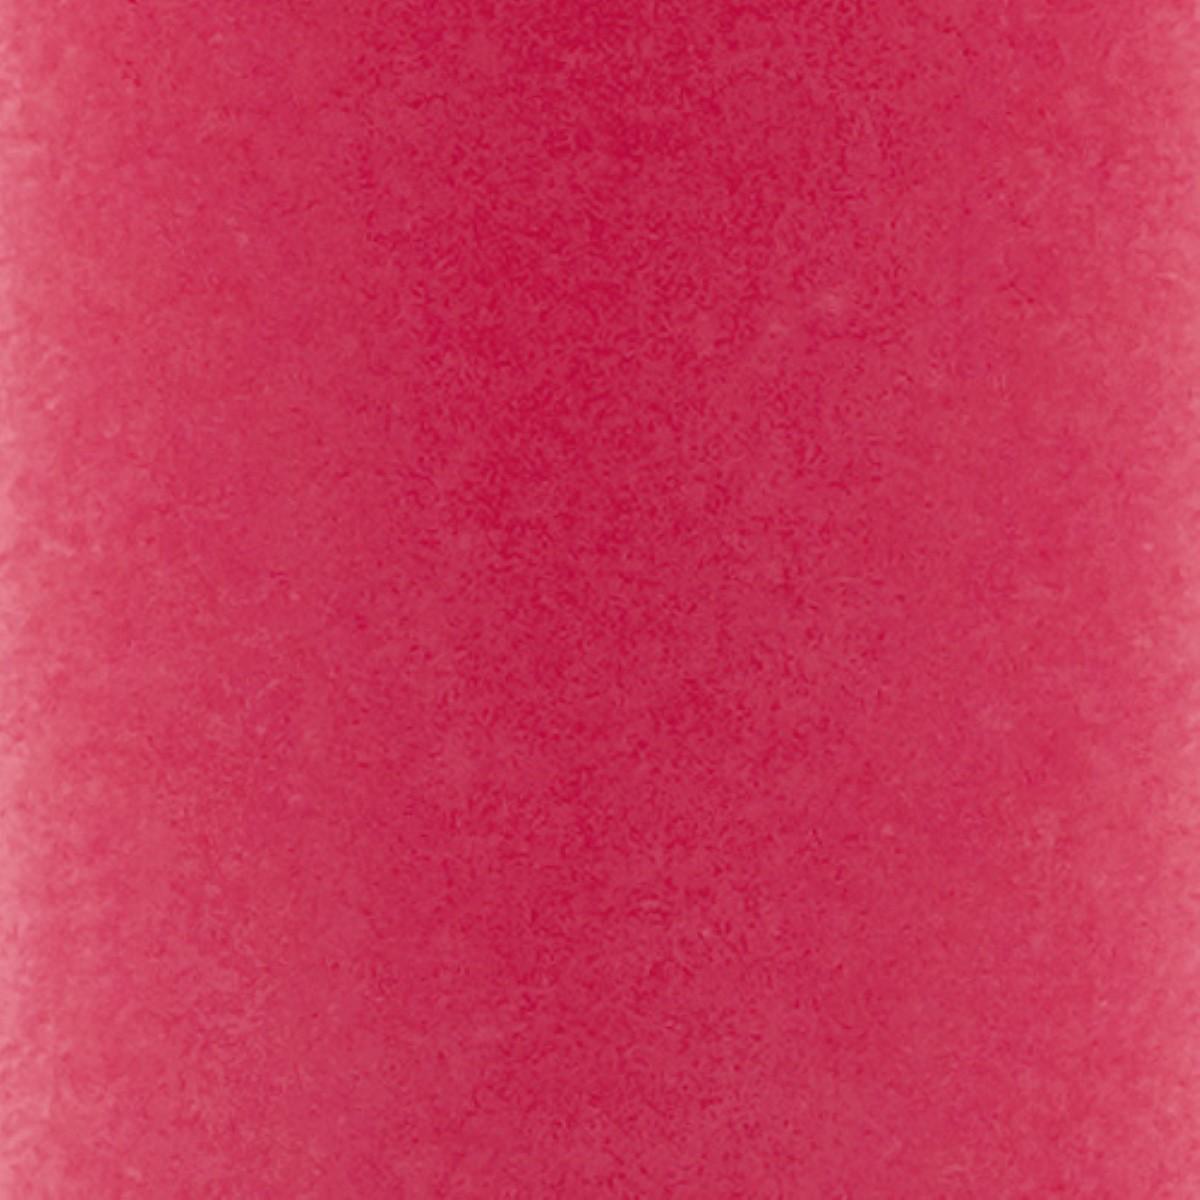 44730017maluwilztruemattlipfluidvibrantcoraldot